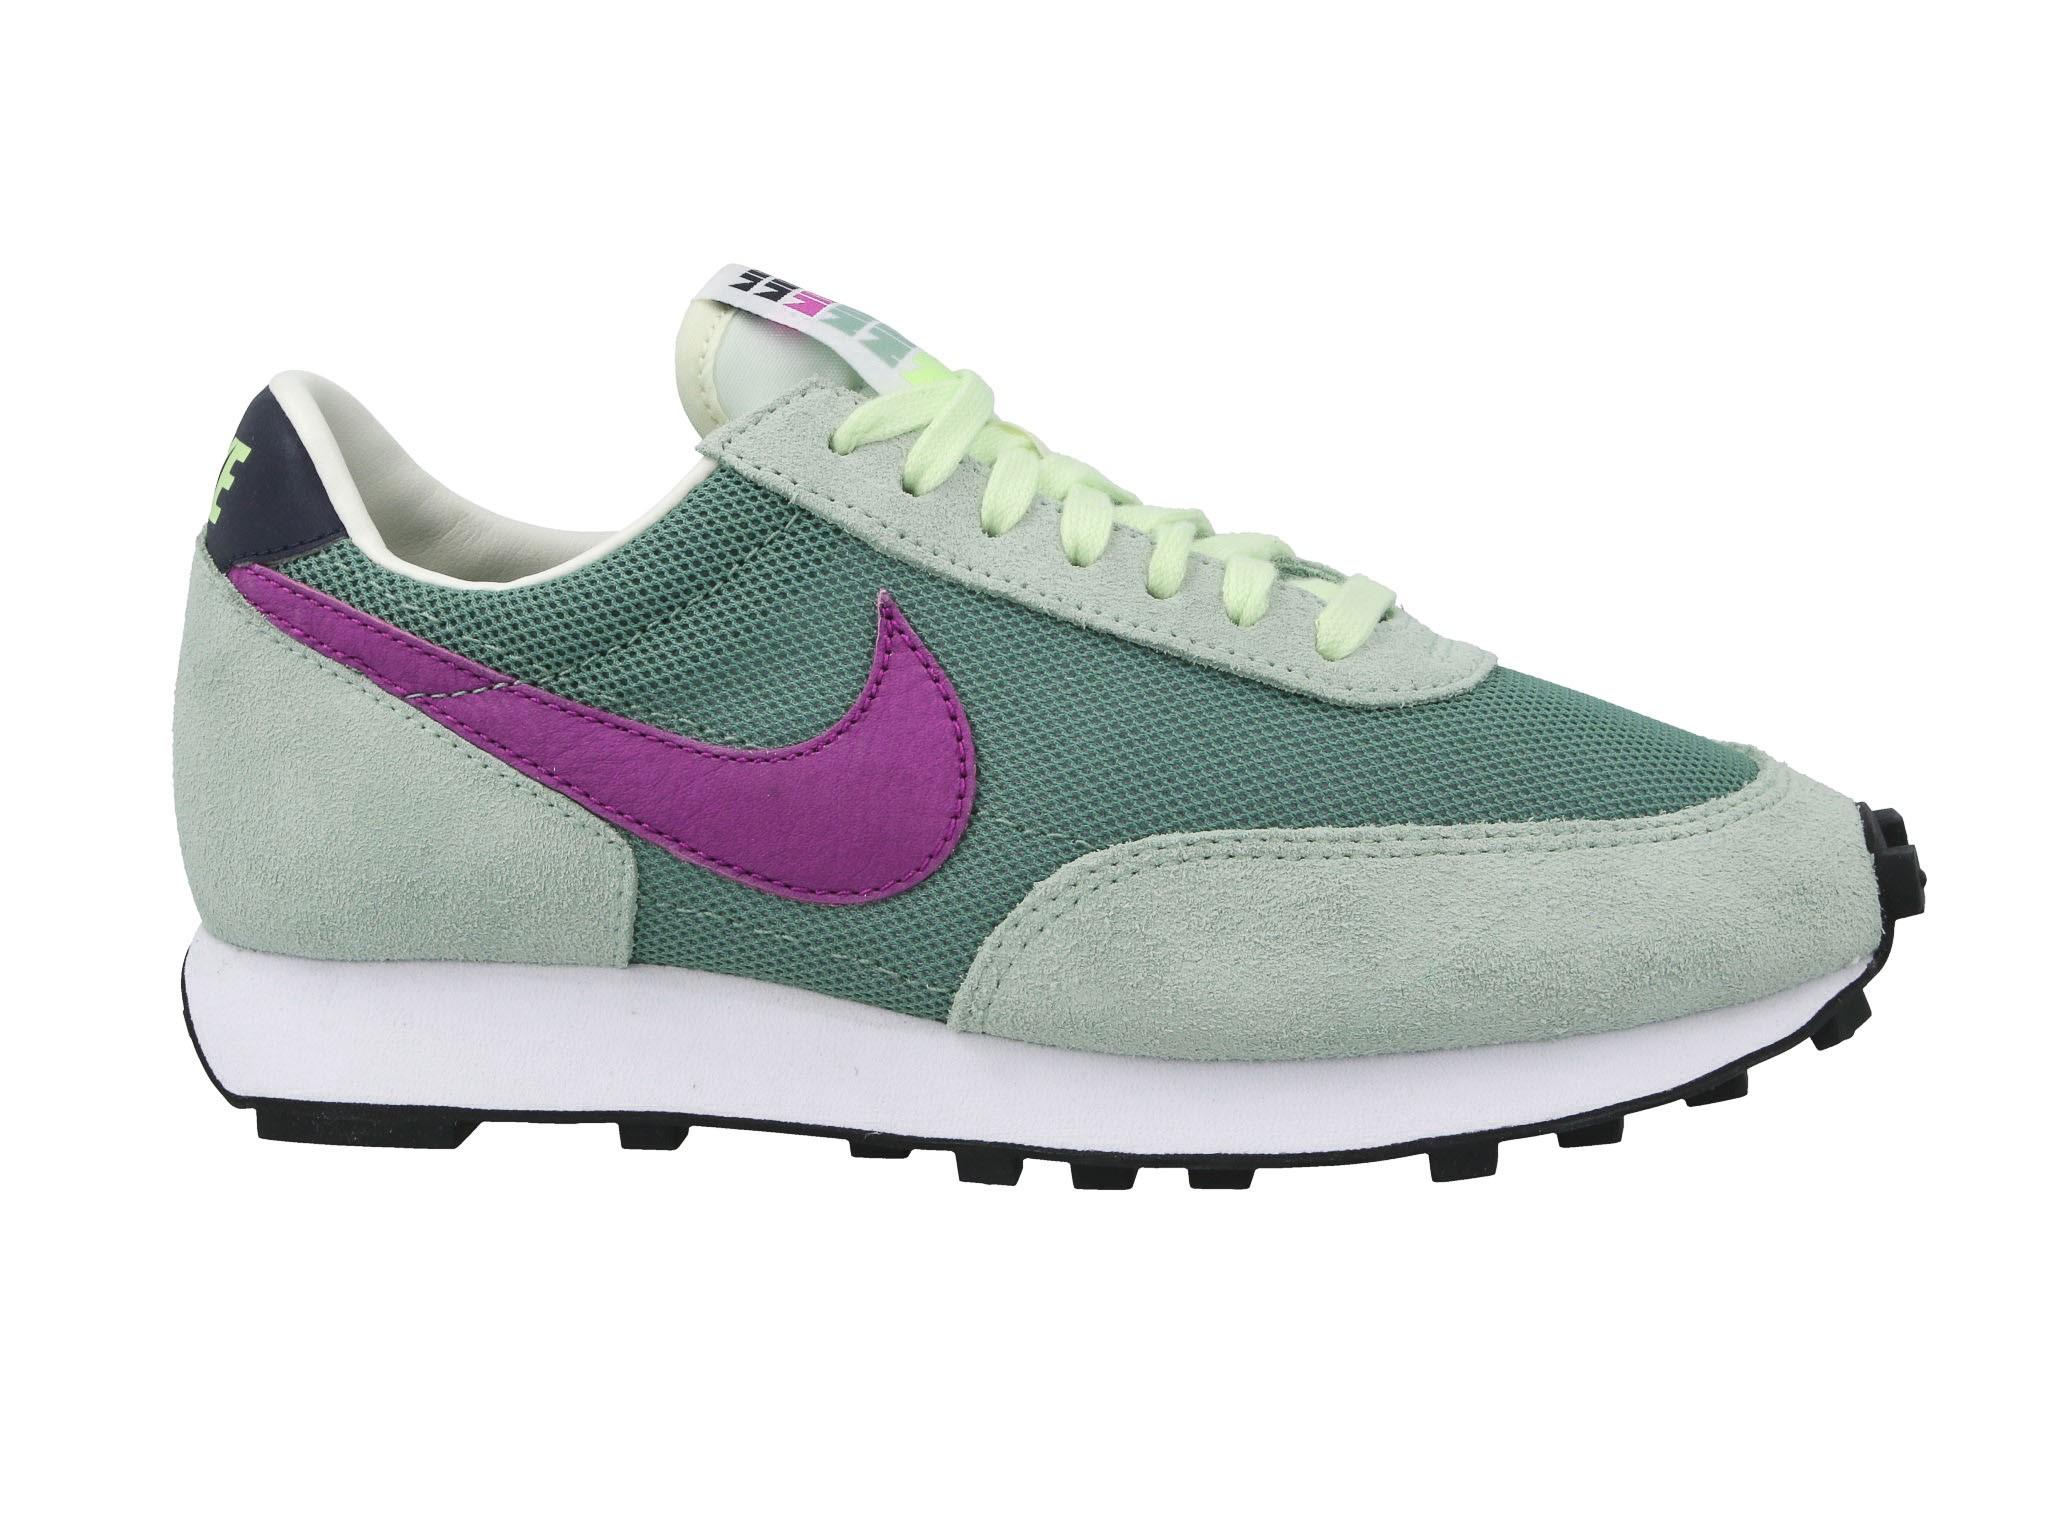 Cipő NIKE - Daybreak CQ6358 300 Silver Pine/Hyper Violet  - Sneakers - Félcipő - Női